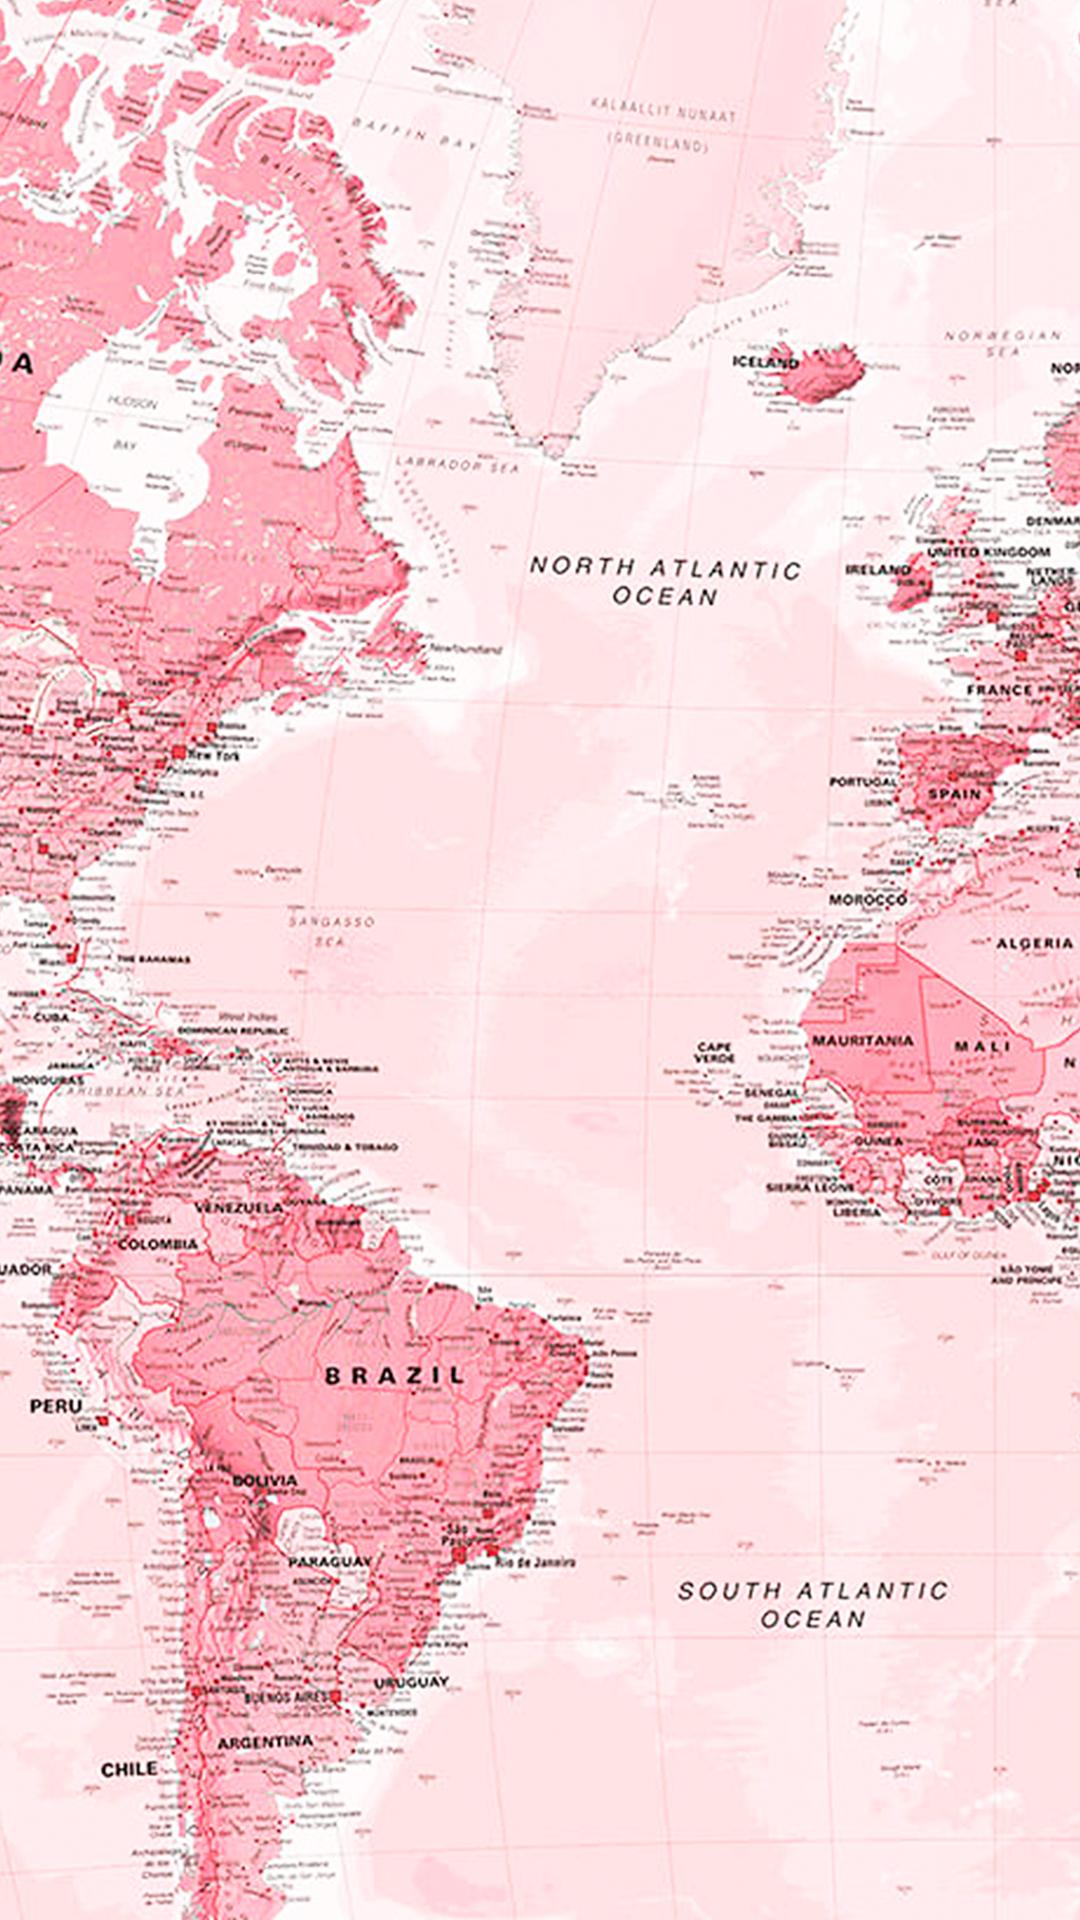 Wallpaper Mapa Mundi Rosa By Gocase In 2020 Aesthetic Iphone Wallpaper Pink Wallpaper Iphone World Map Wallpaper